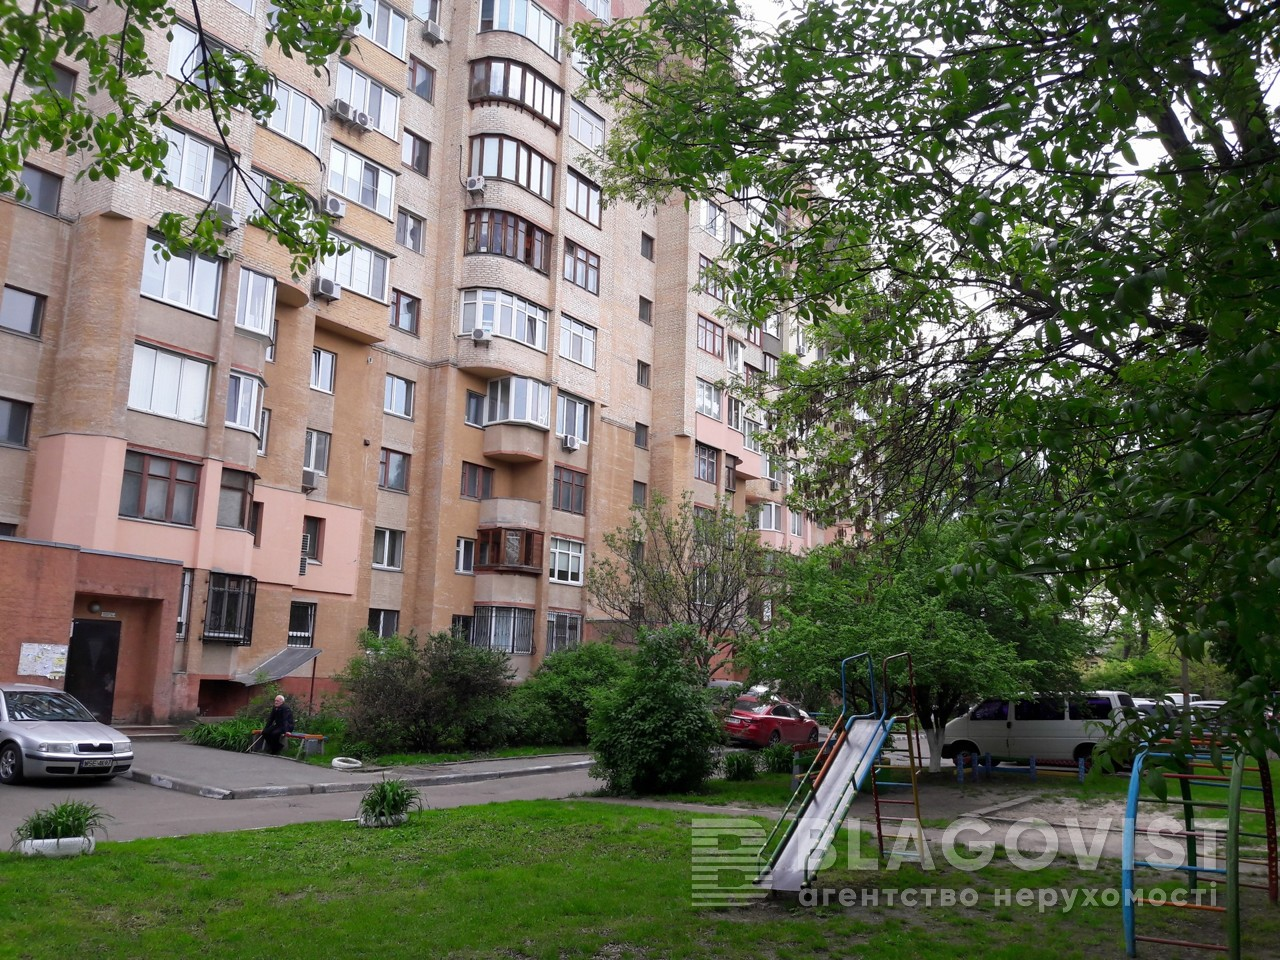 Квартира D-35847, Гавела Вацлава бульв. (Лепсе Ивана), 34б, Киев - Фото 2